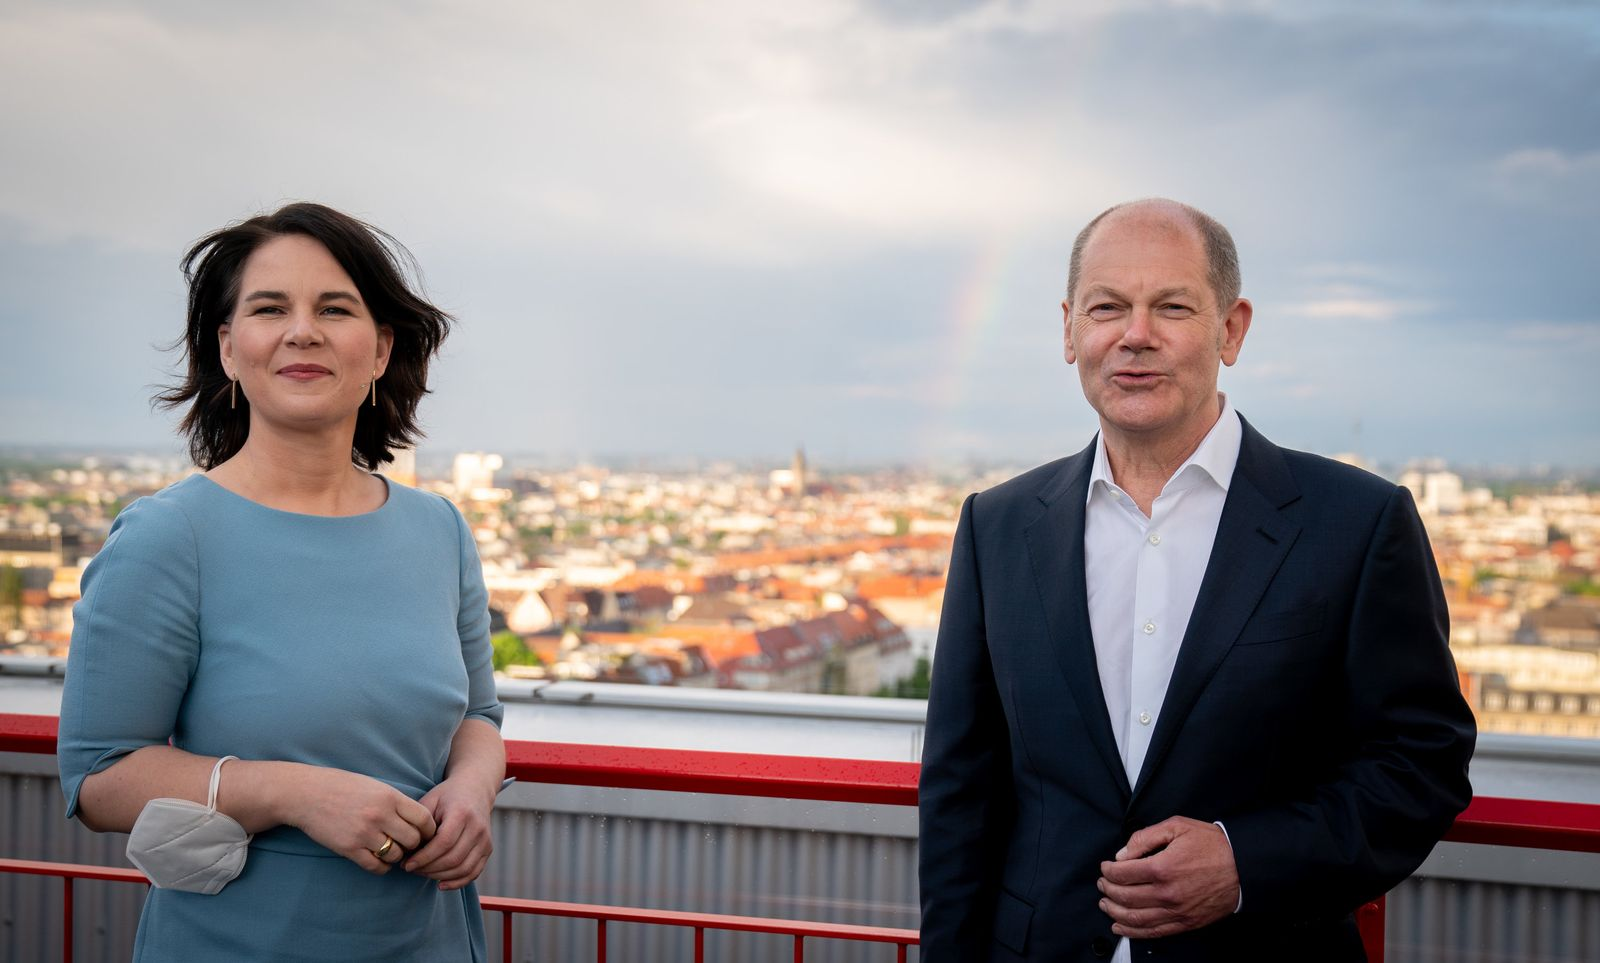 Annalena Baerbock und Olaf Scholz